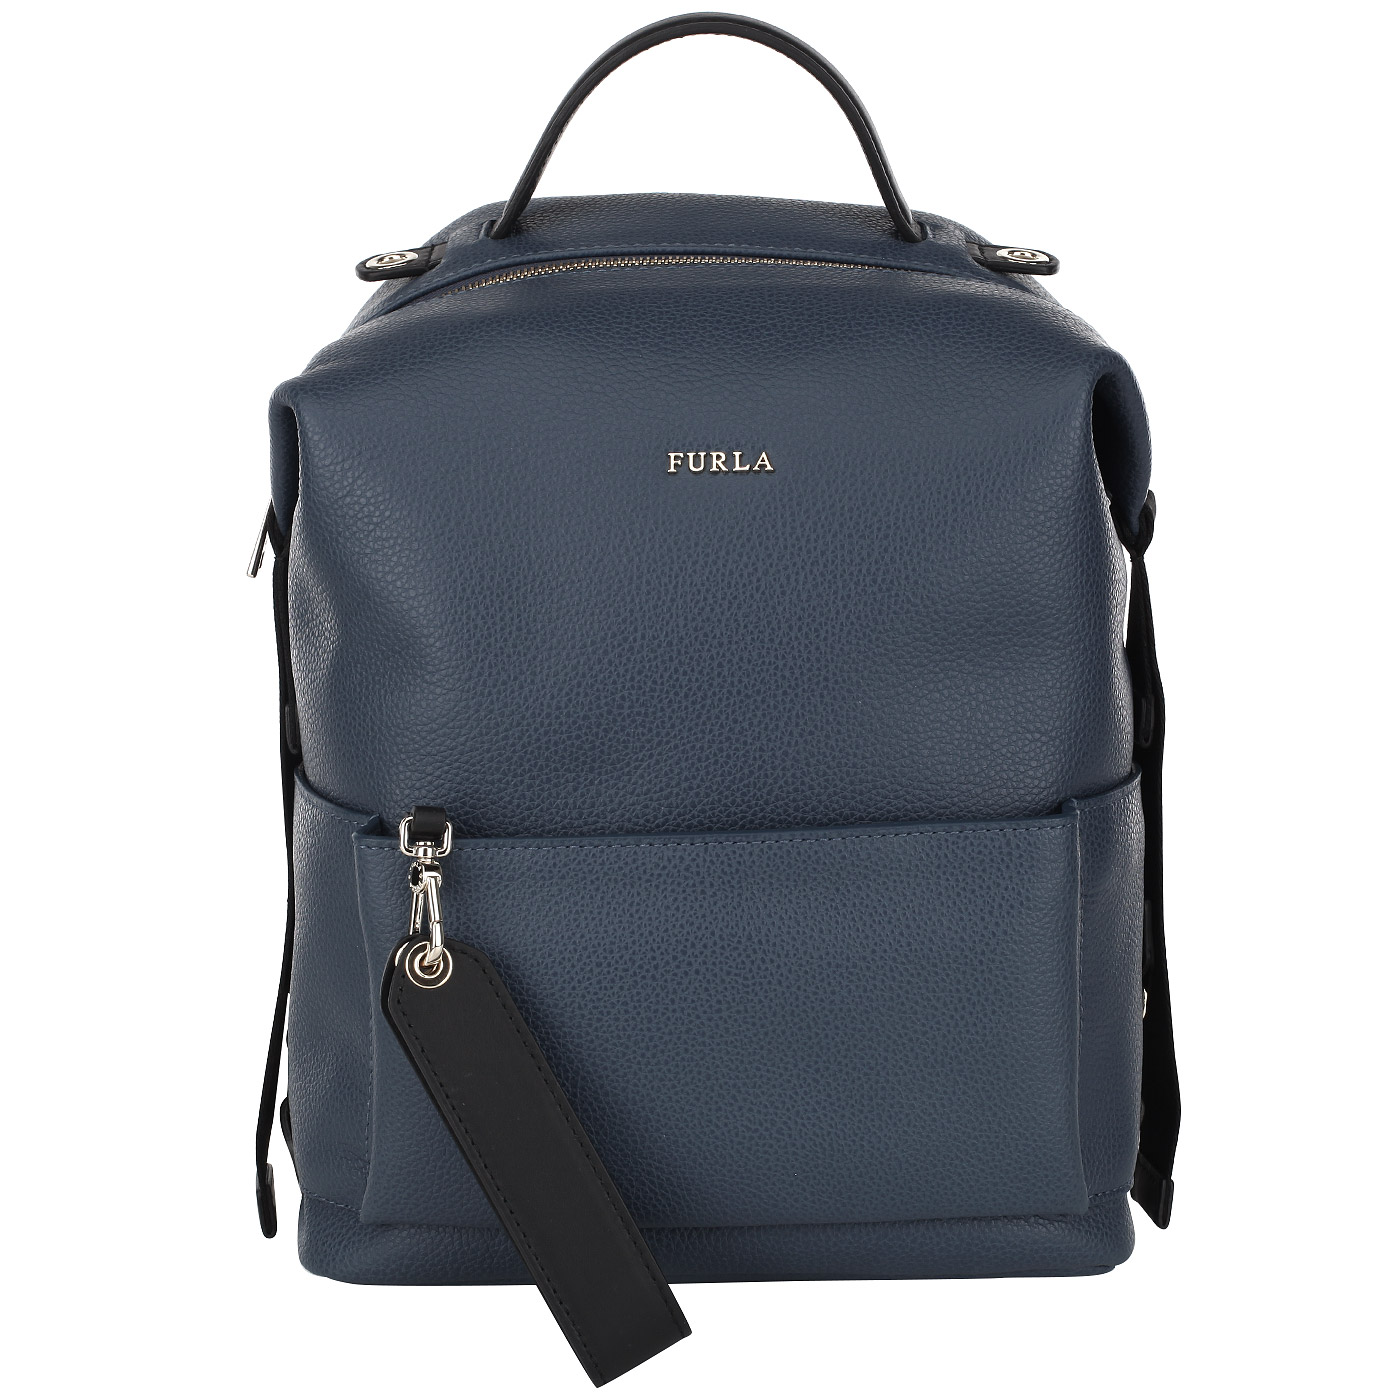 Рюкзак синего цвета